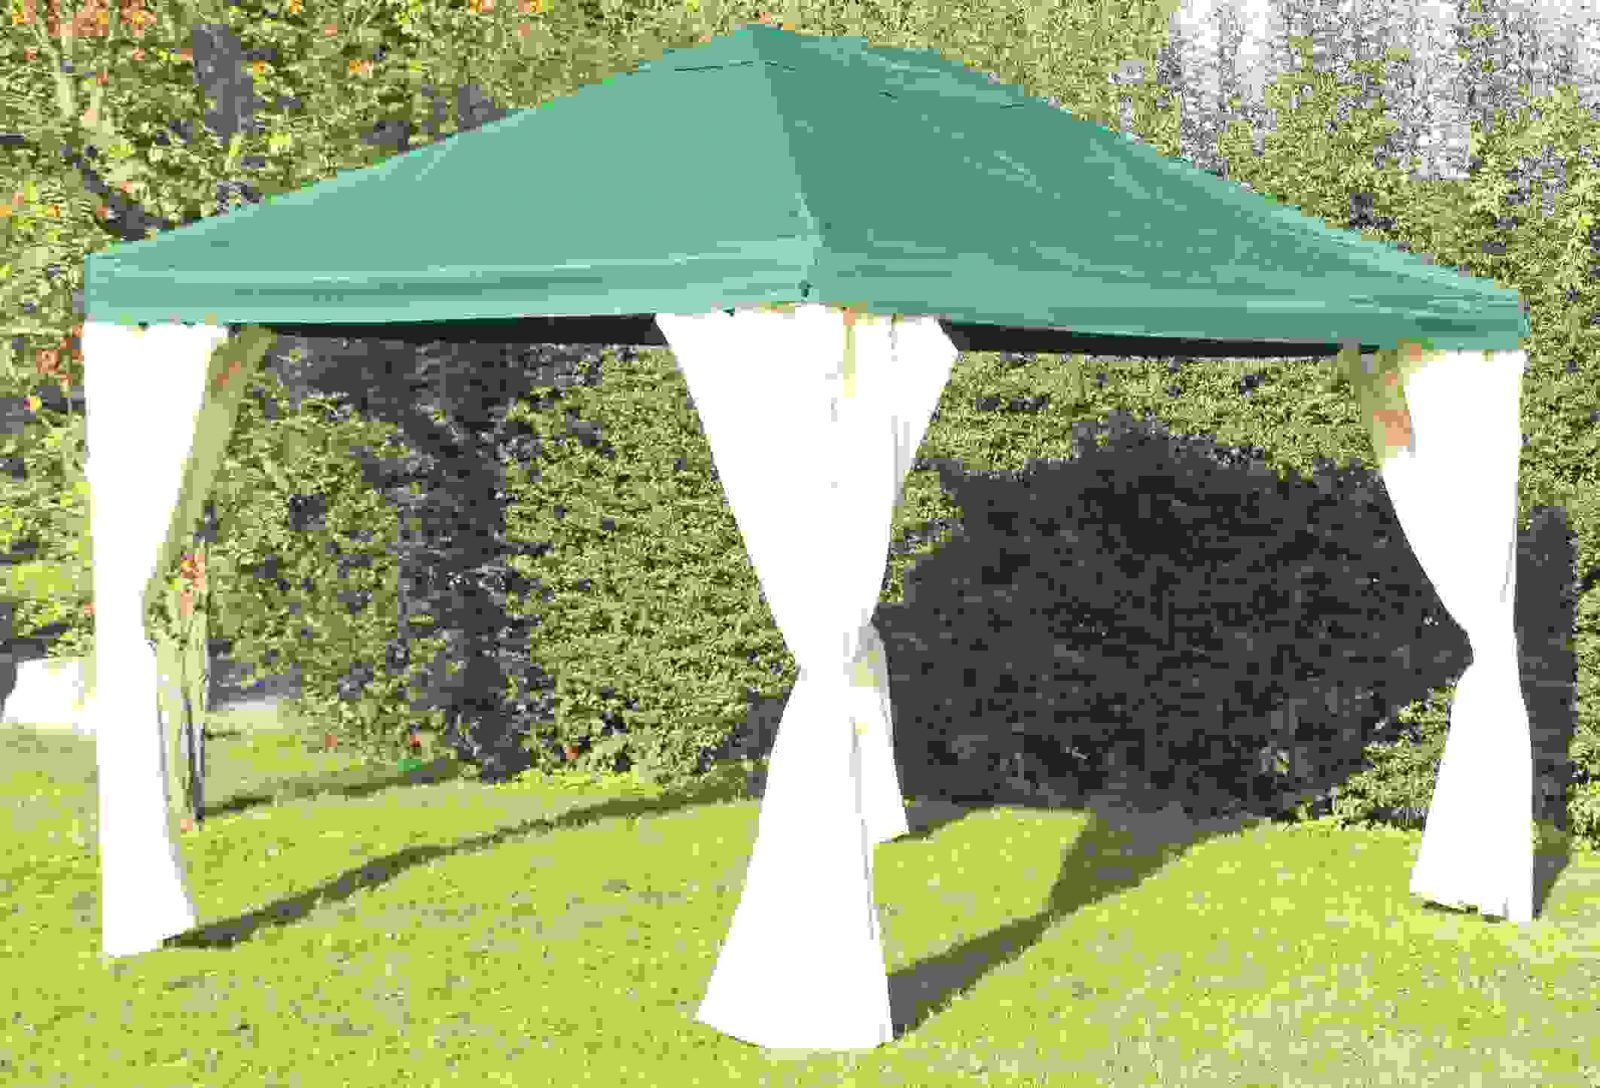 Luxus 40 Pavillon 3X4 Wasserdicht Stabil Planen  Einzigartiger Garten von Pavillon 3X4 Wasserdicht Stabil Bild